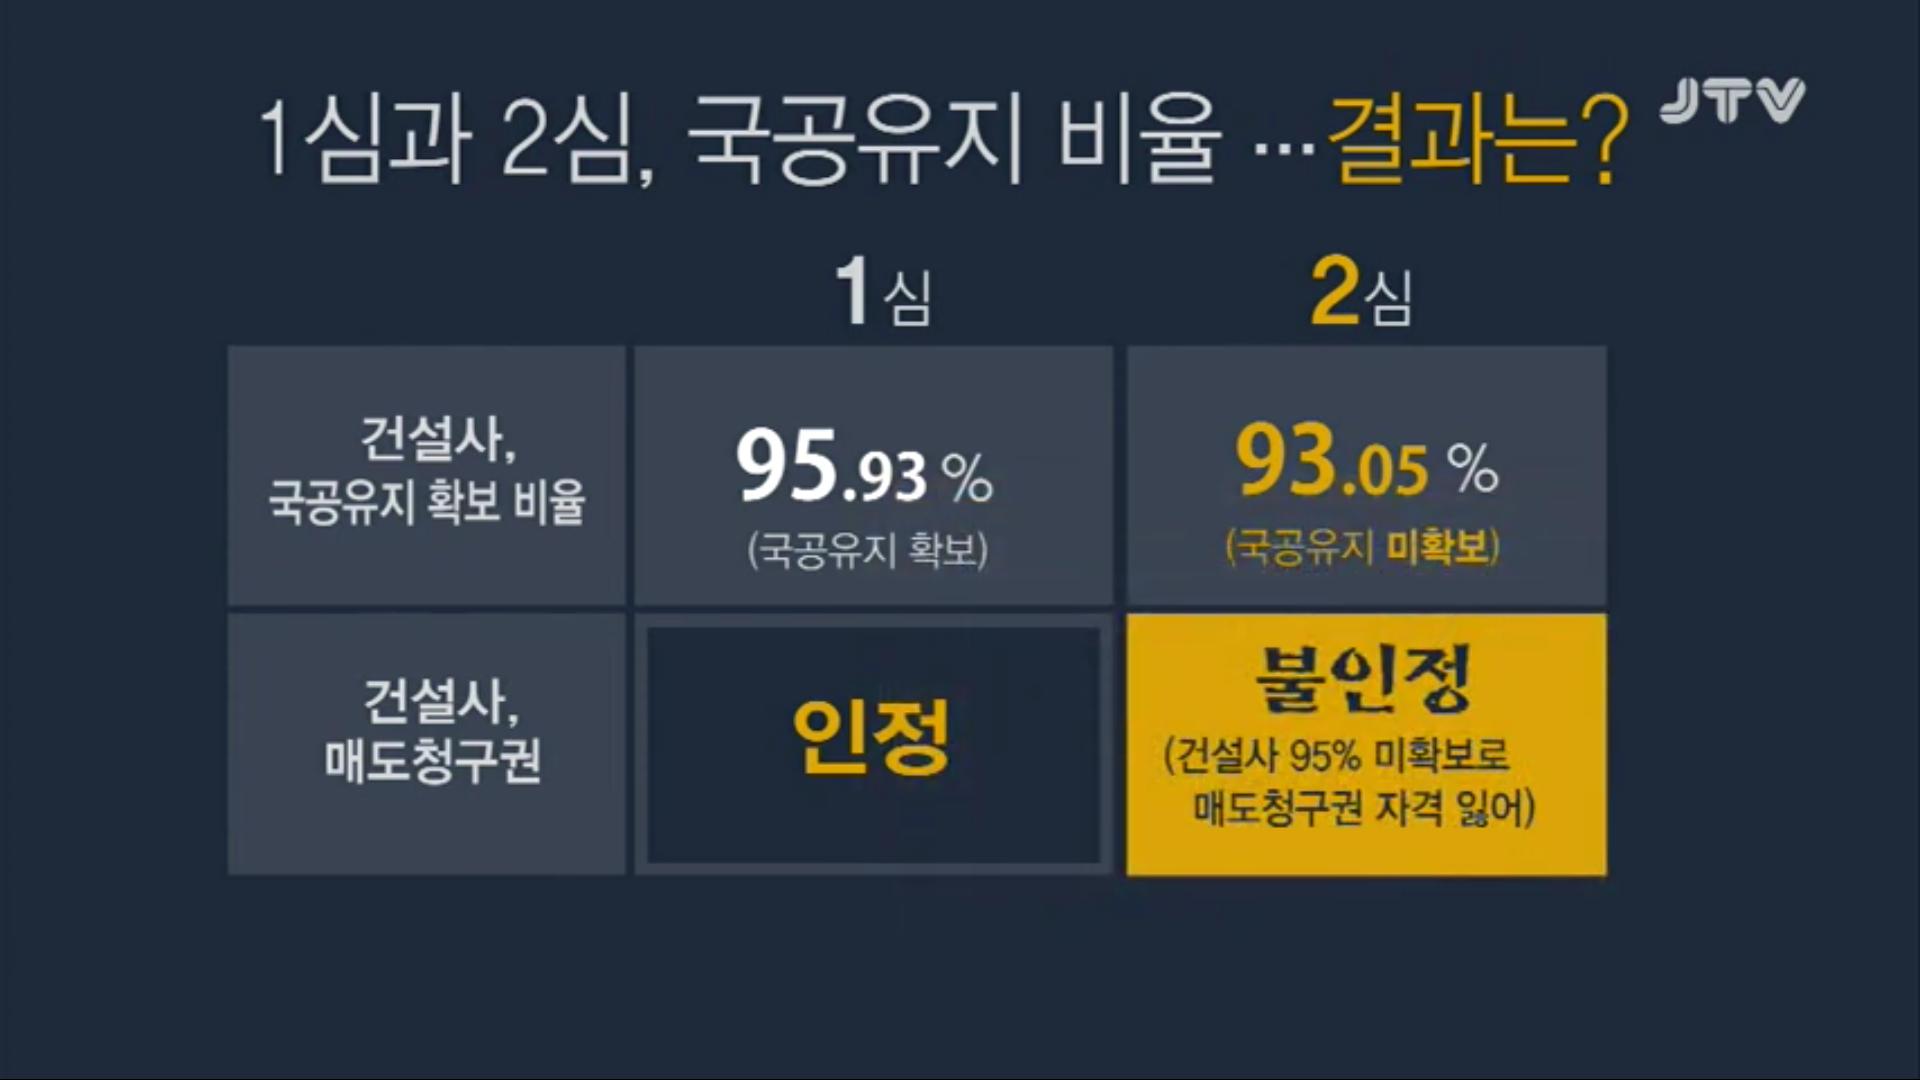 [19.5.3 JTV 현장스토리 판] 고소, 고발 당한 전주시장... 미심쩍은 건축행정4.png